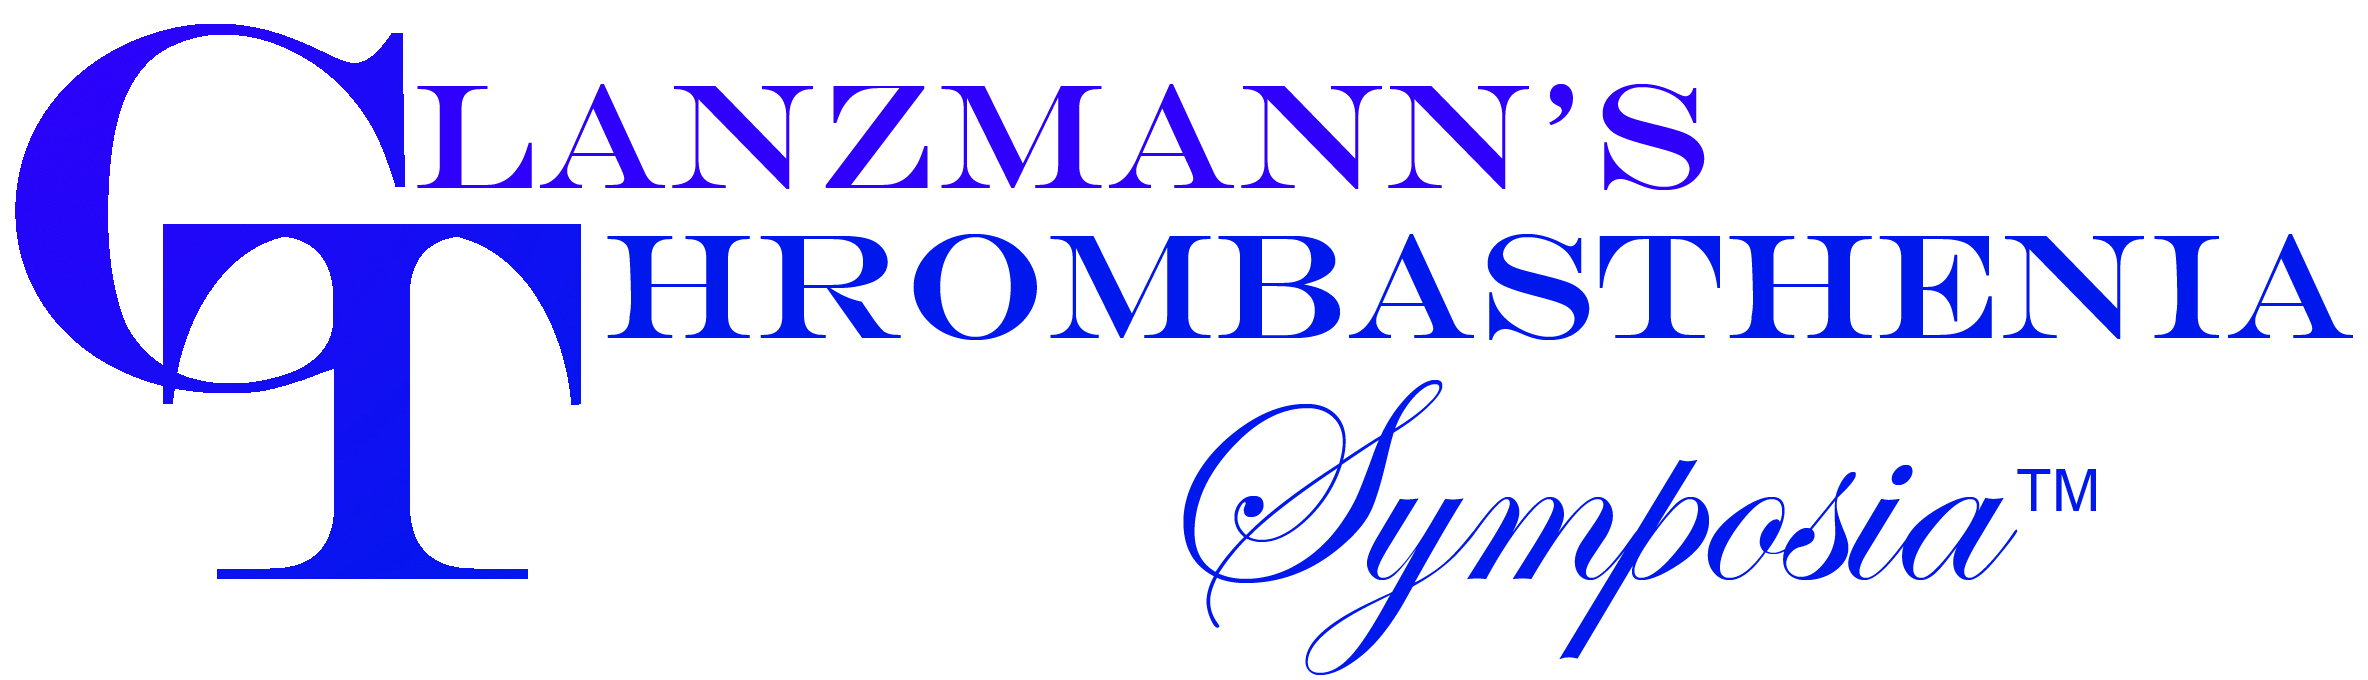 GT_Logo(HiRes).jpg